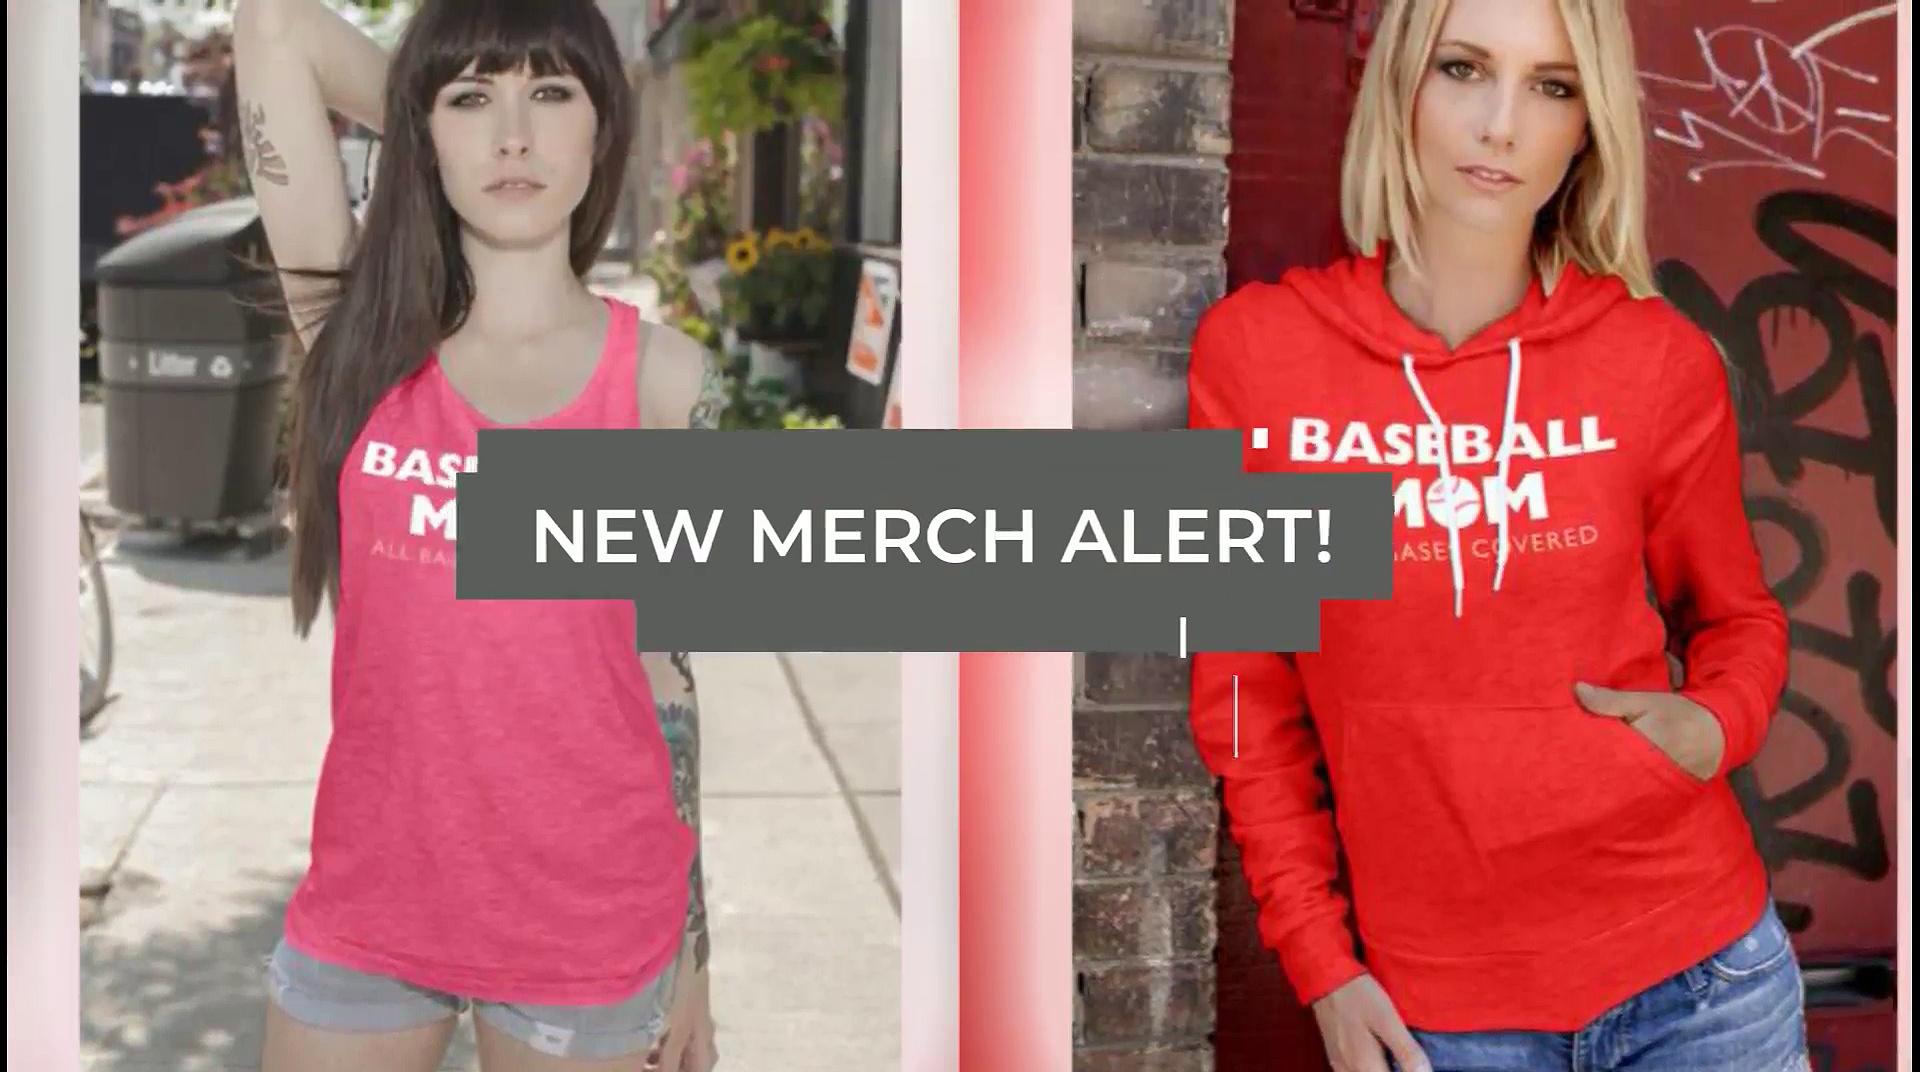 Baseball Mom T Shirts – Behind Every Baseball Player Is A Baseball Mom Great T-Shirts